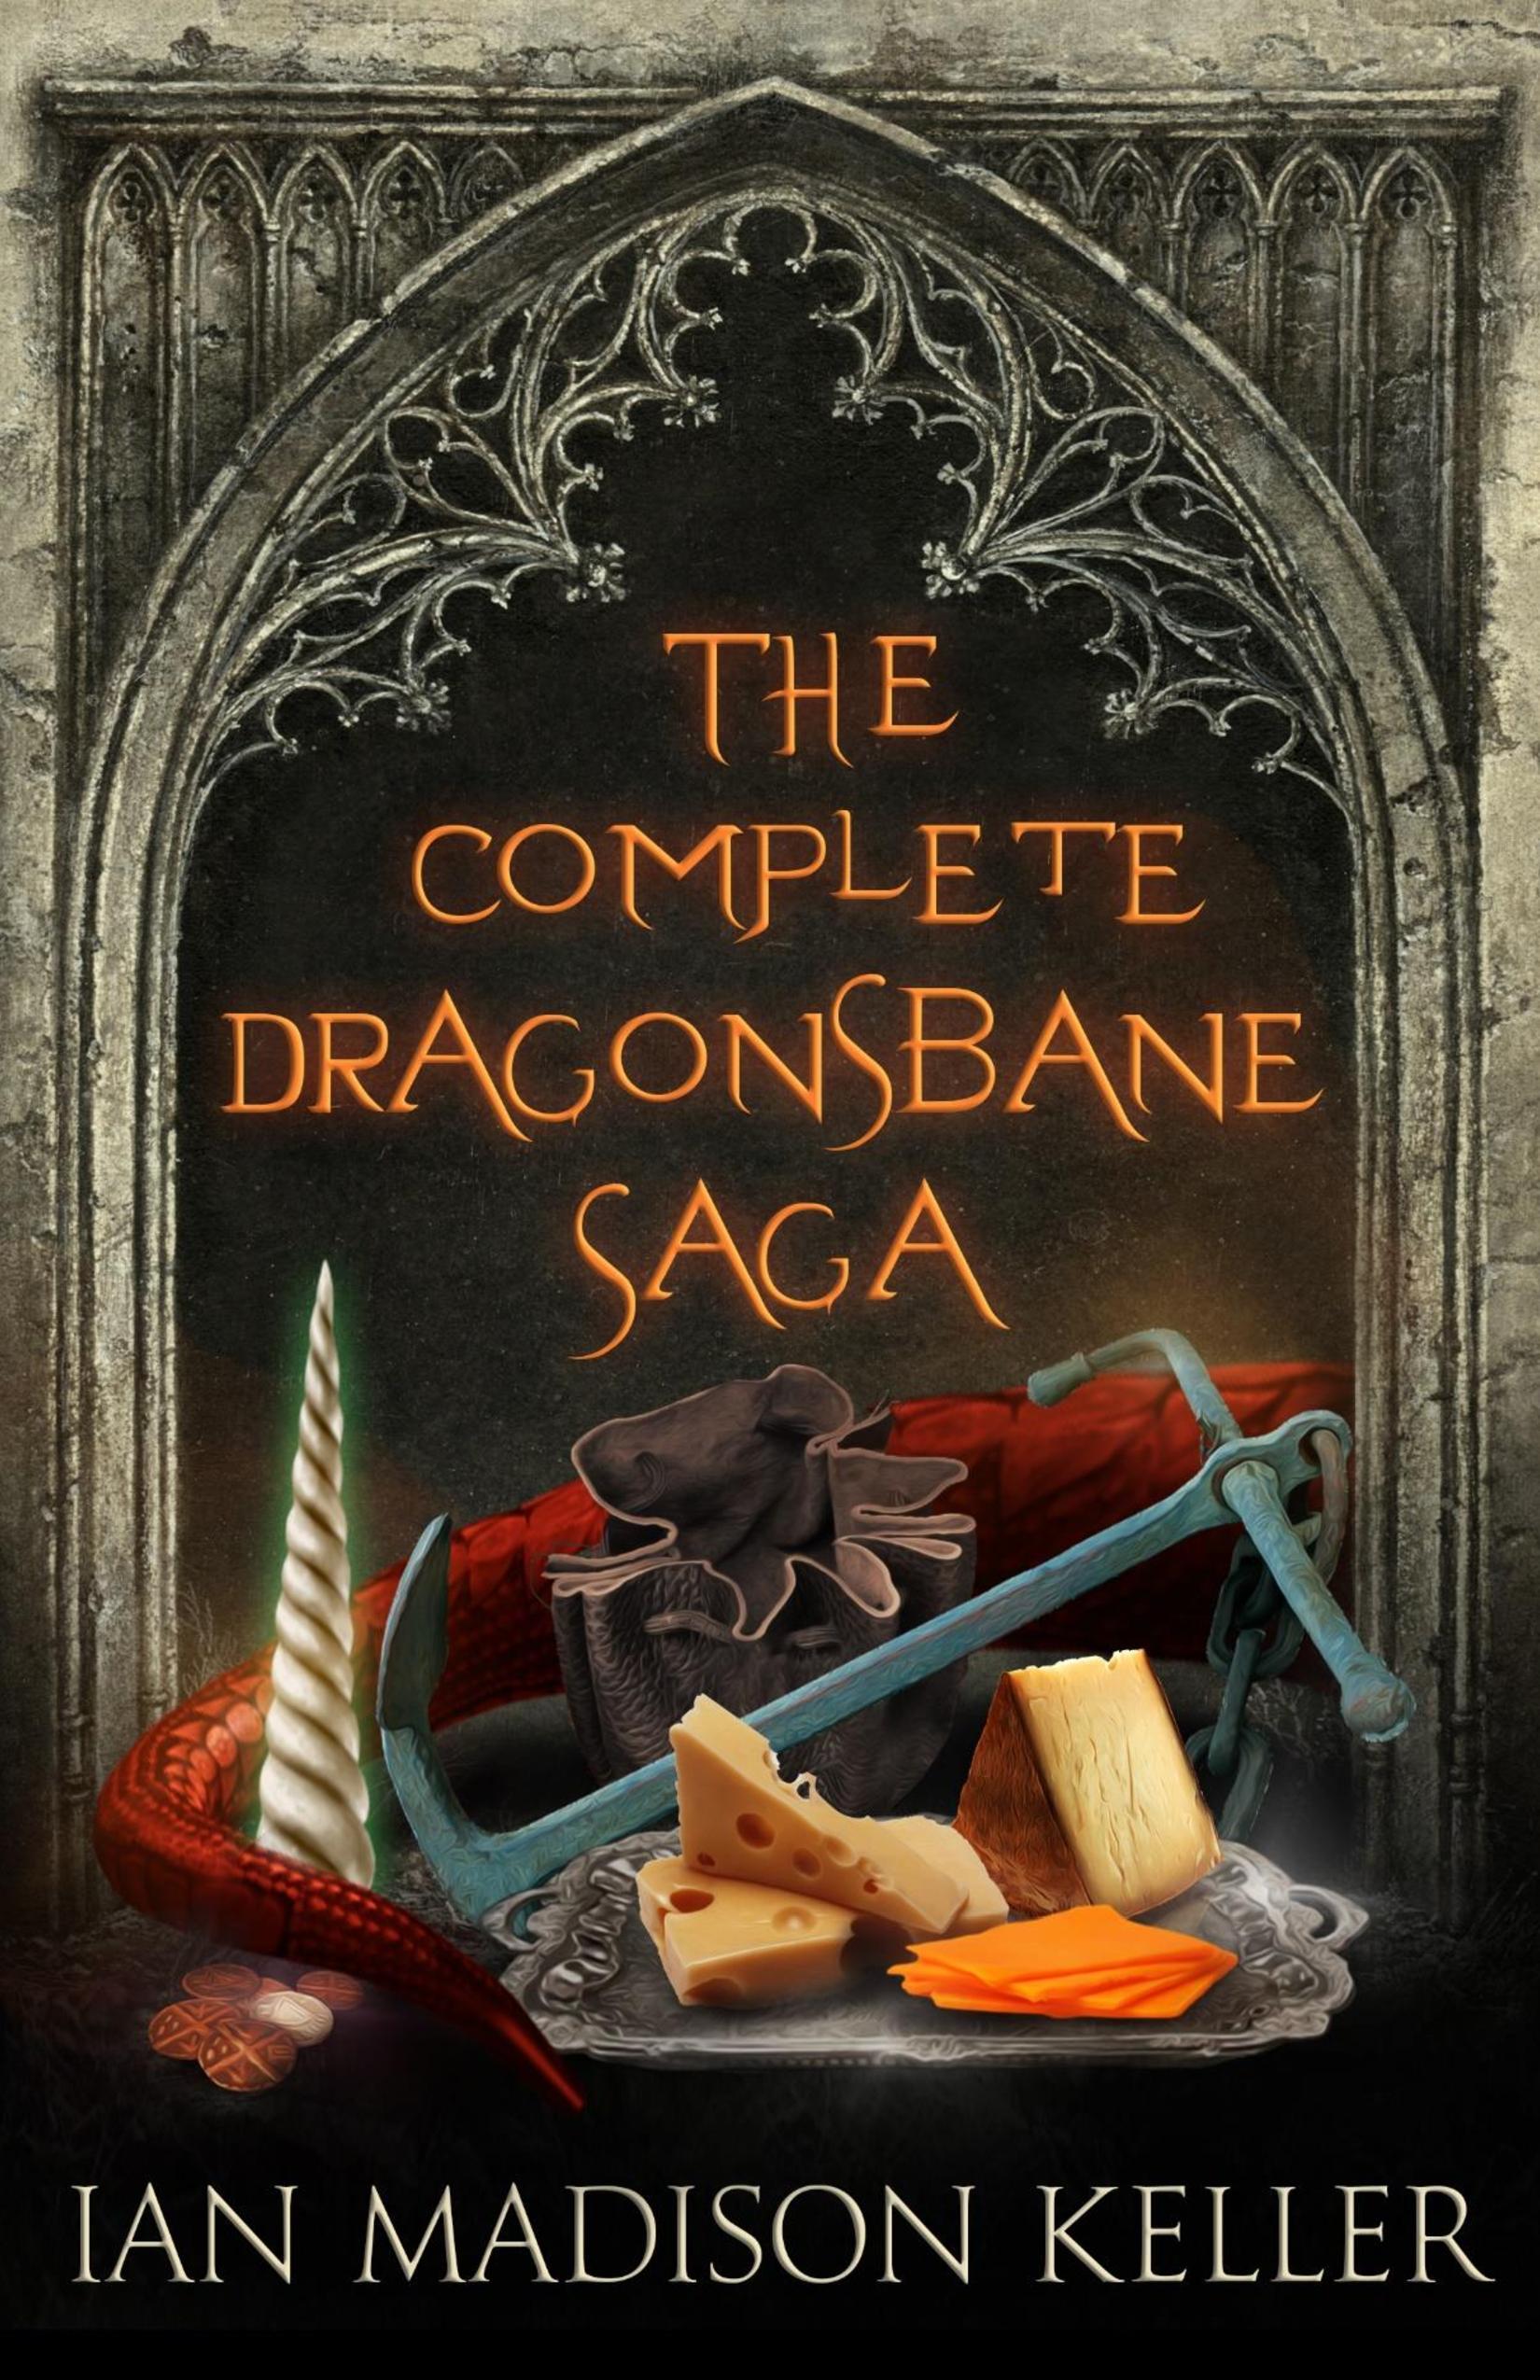 The Complete Dragonsbane Saga